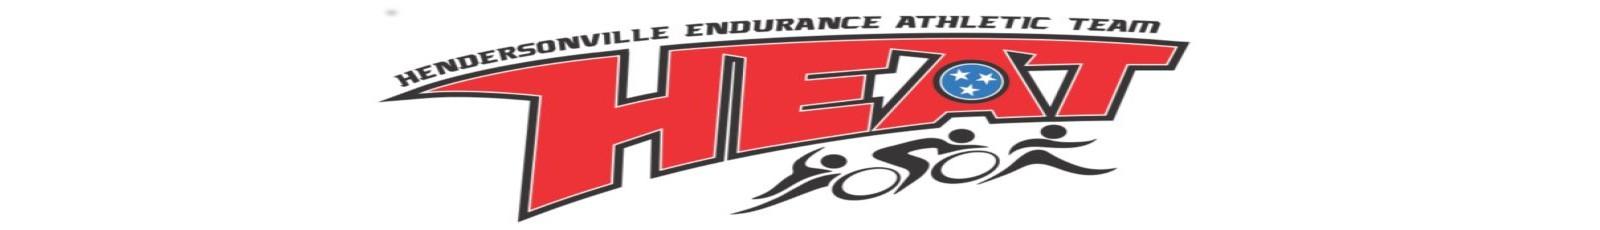 Hendersonville Endurance Athletic Team